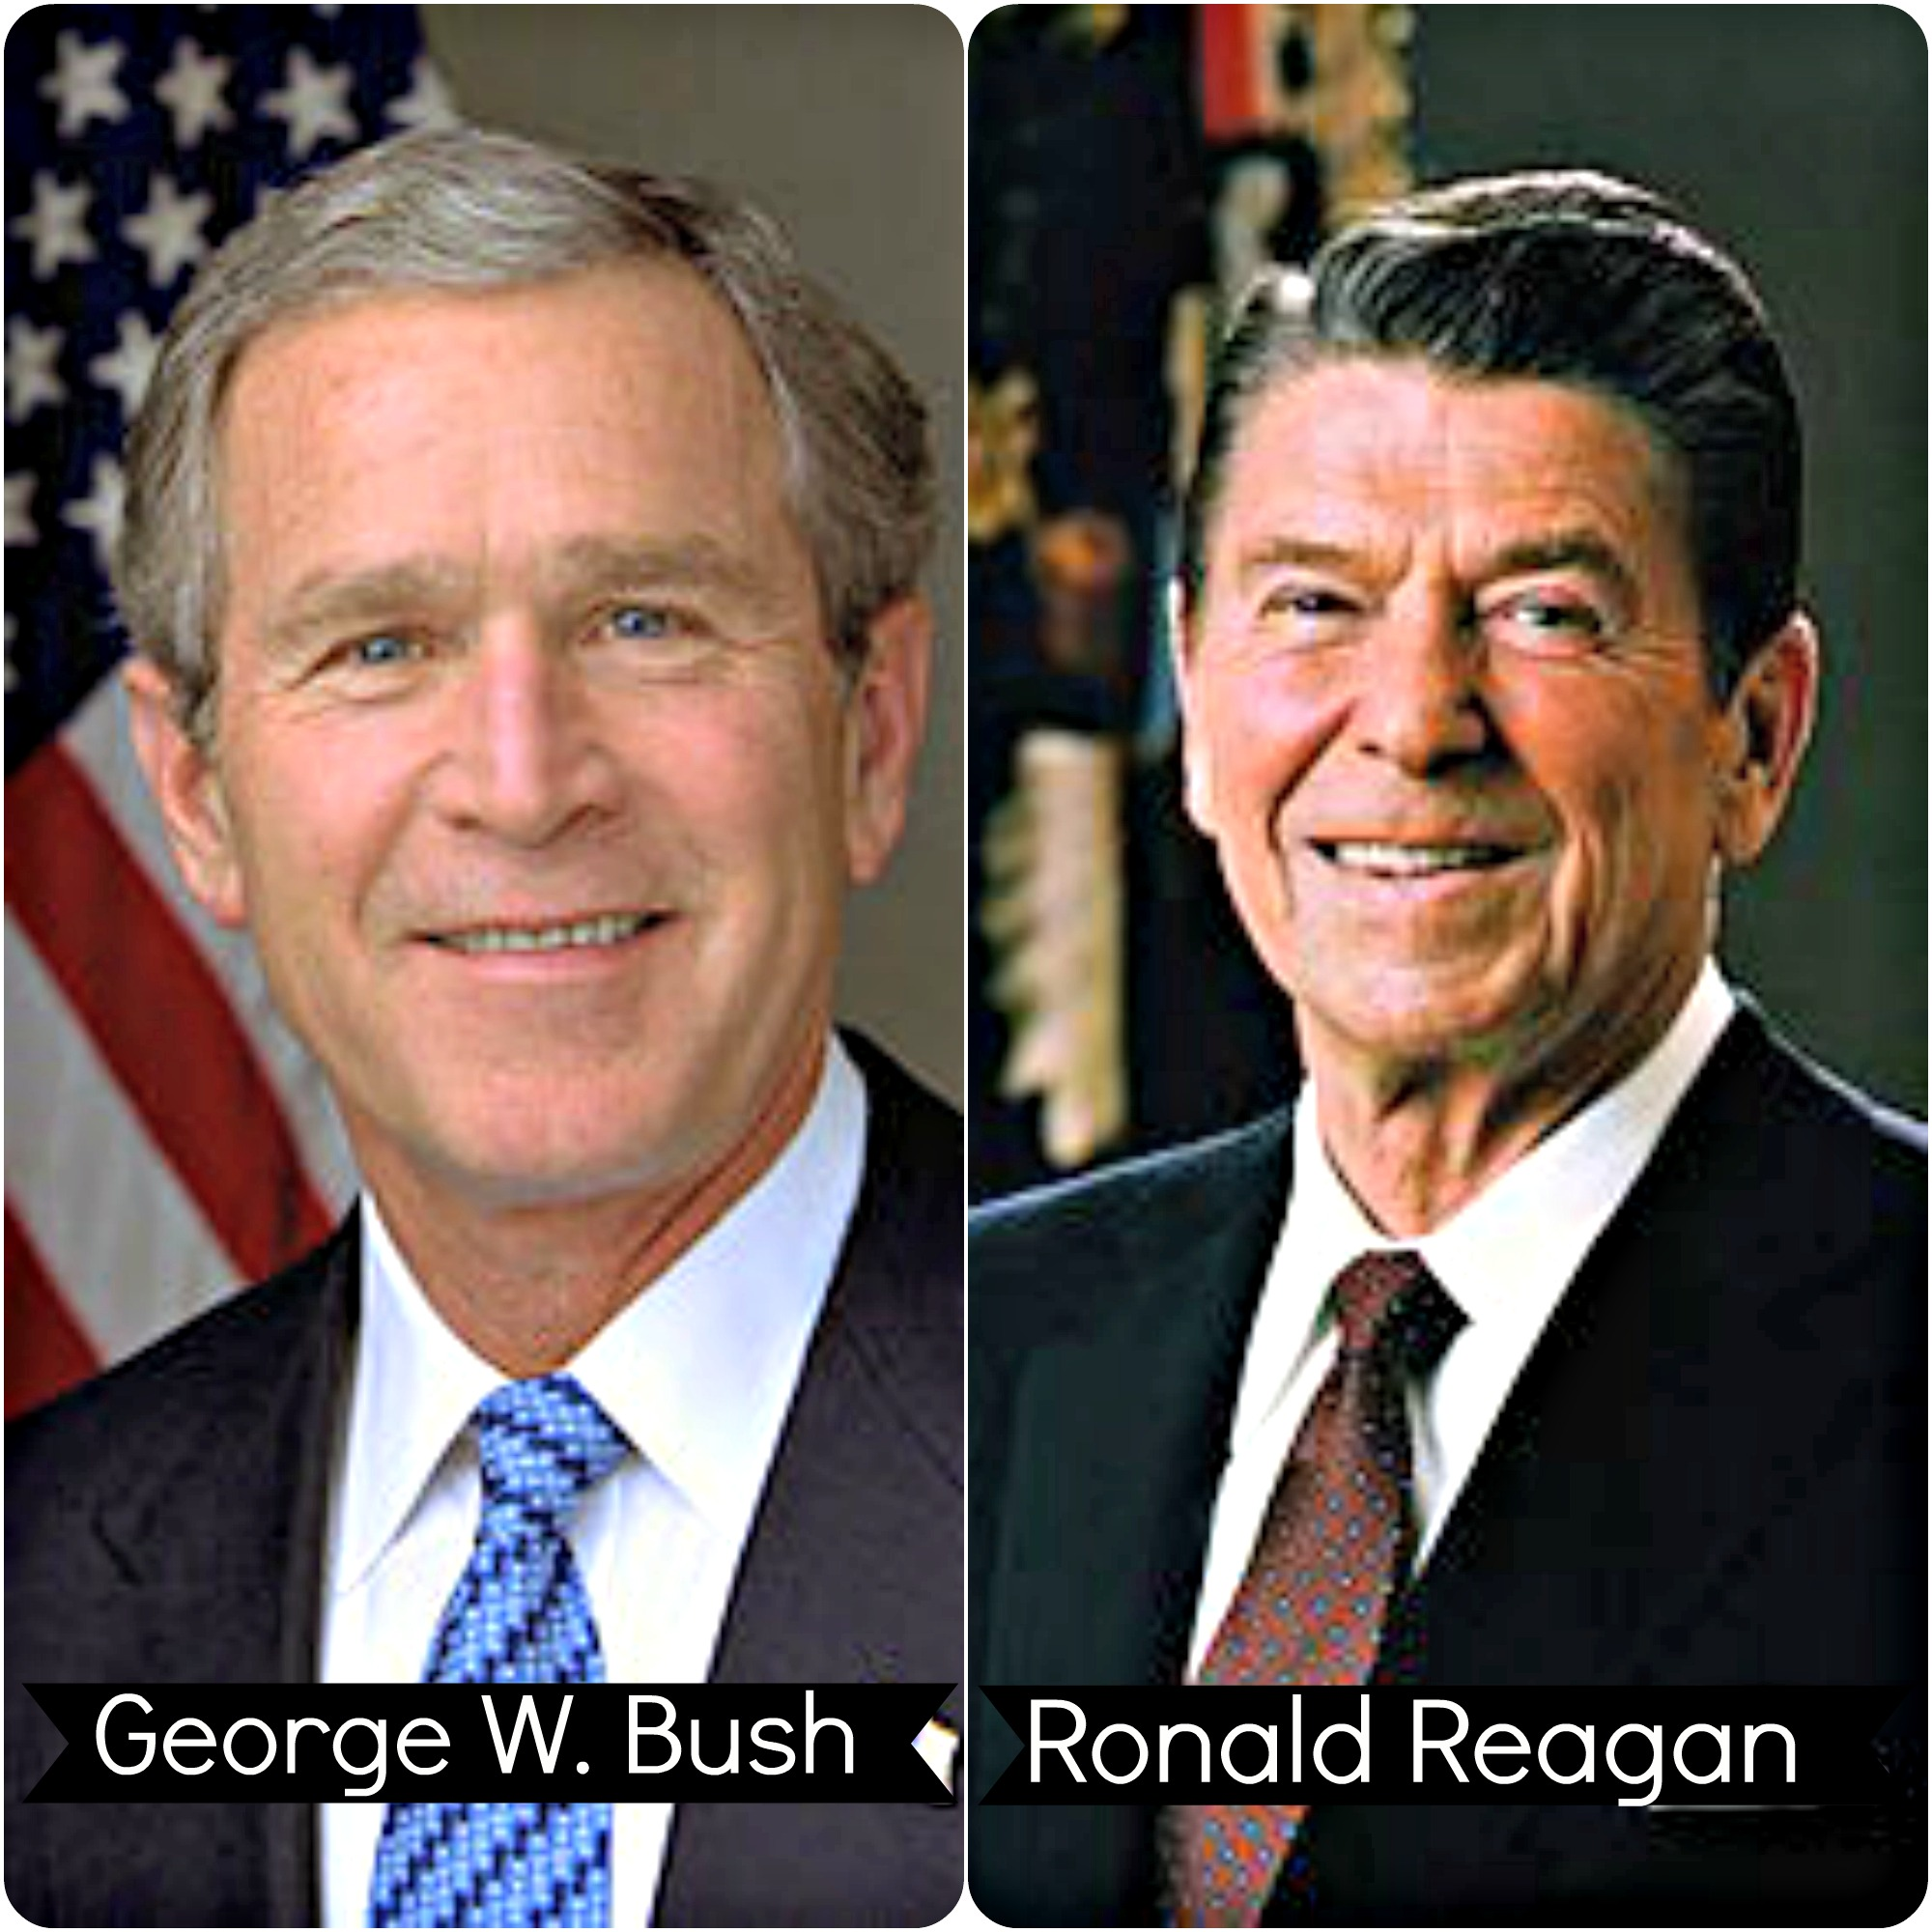 26 Bush and Reagan updated